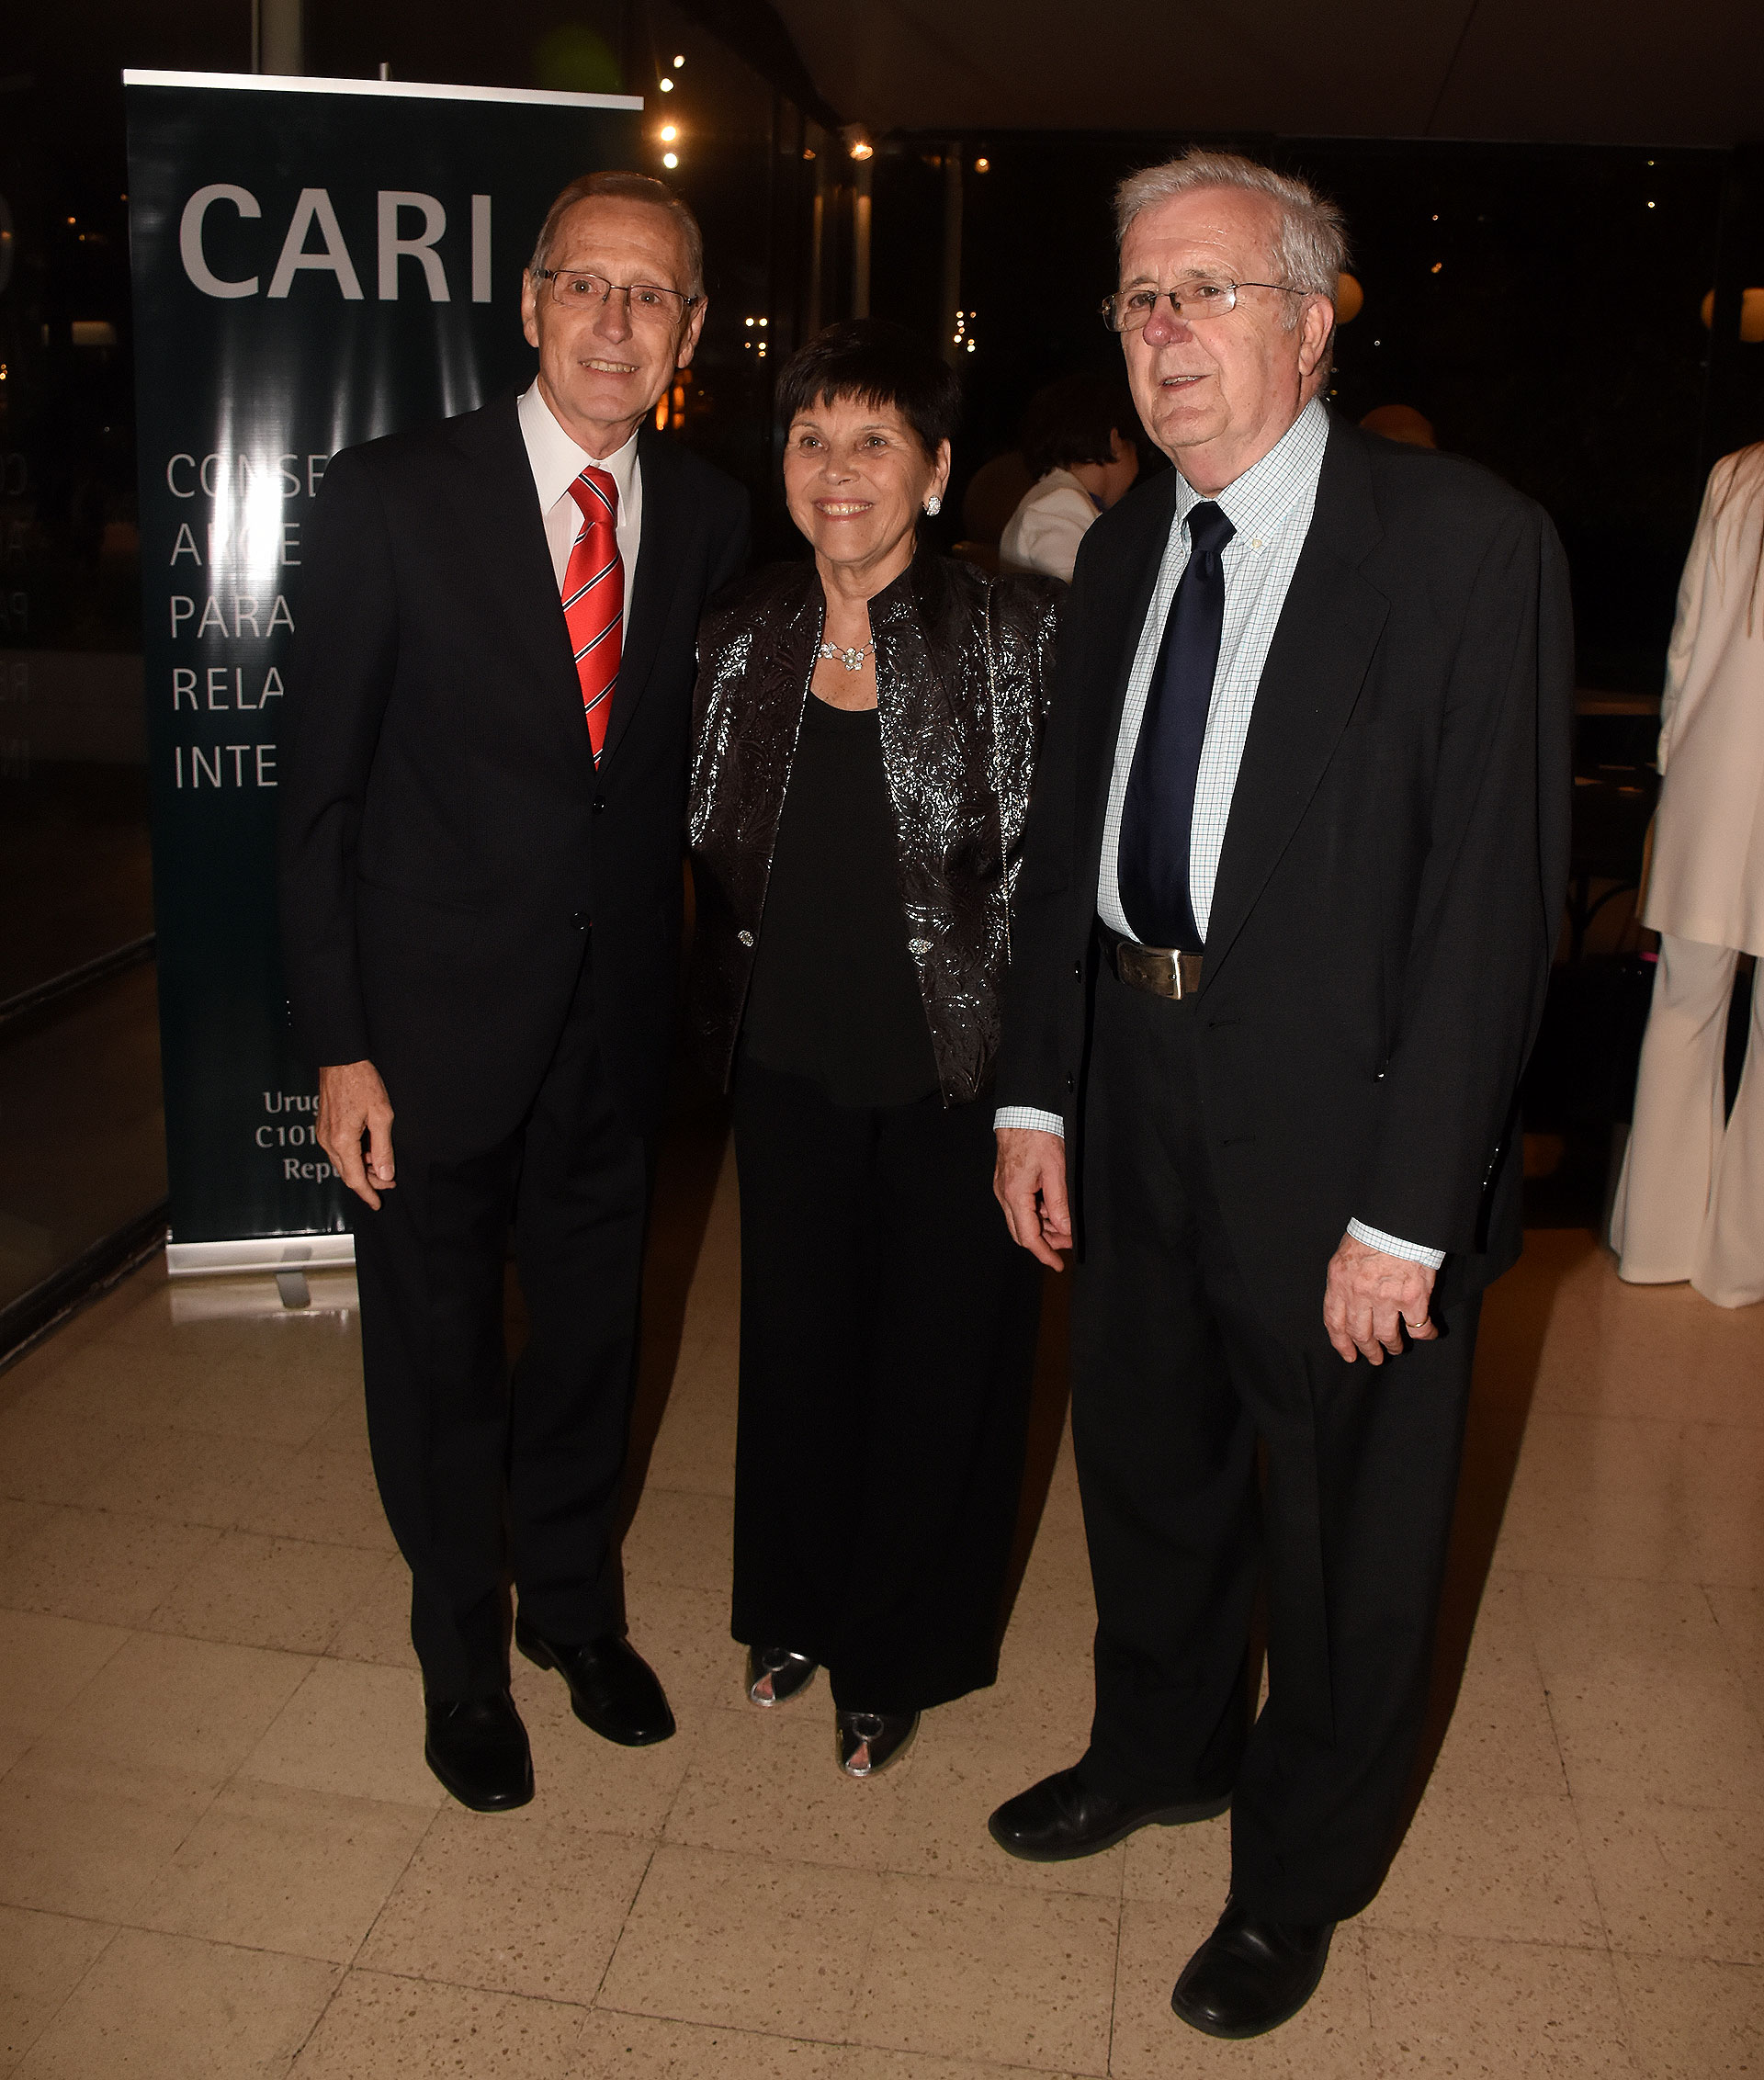 Adalberto Rodríguez Giavarini, Susana Pestana y Félix Peña